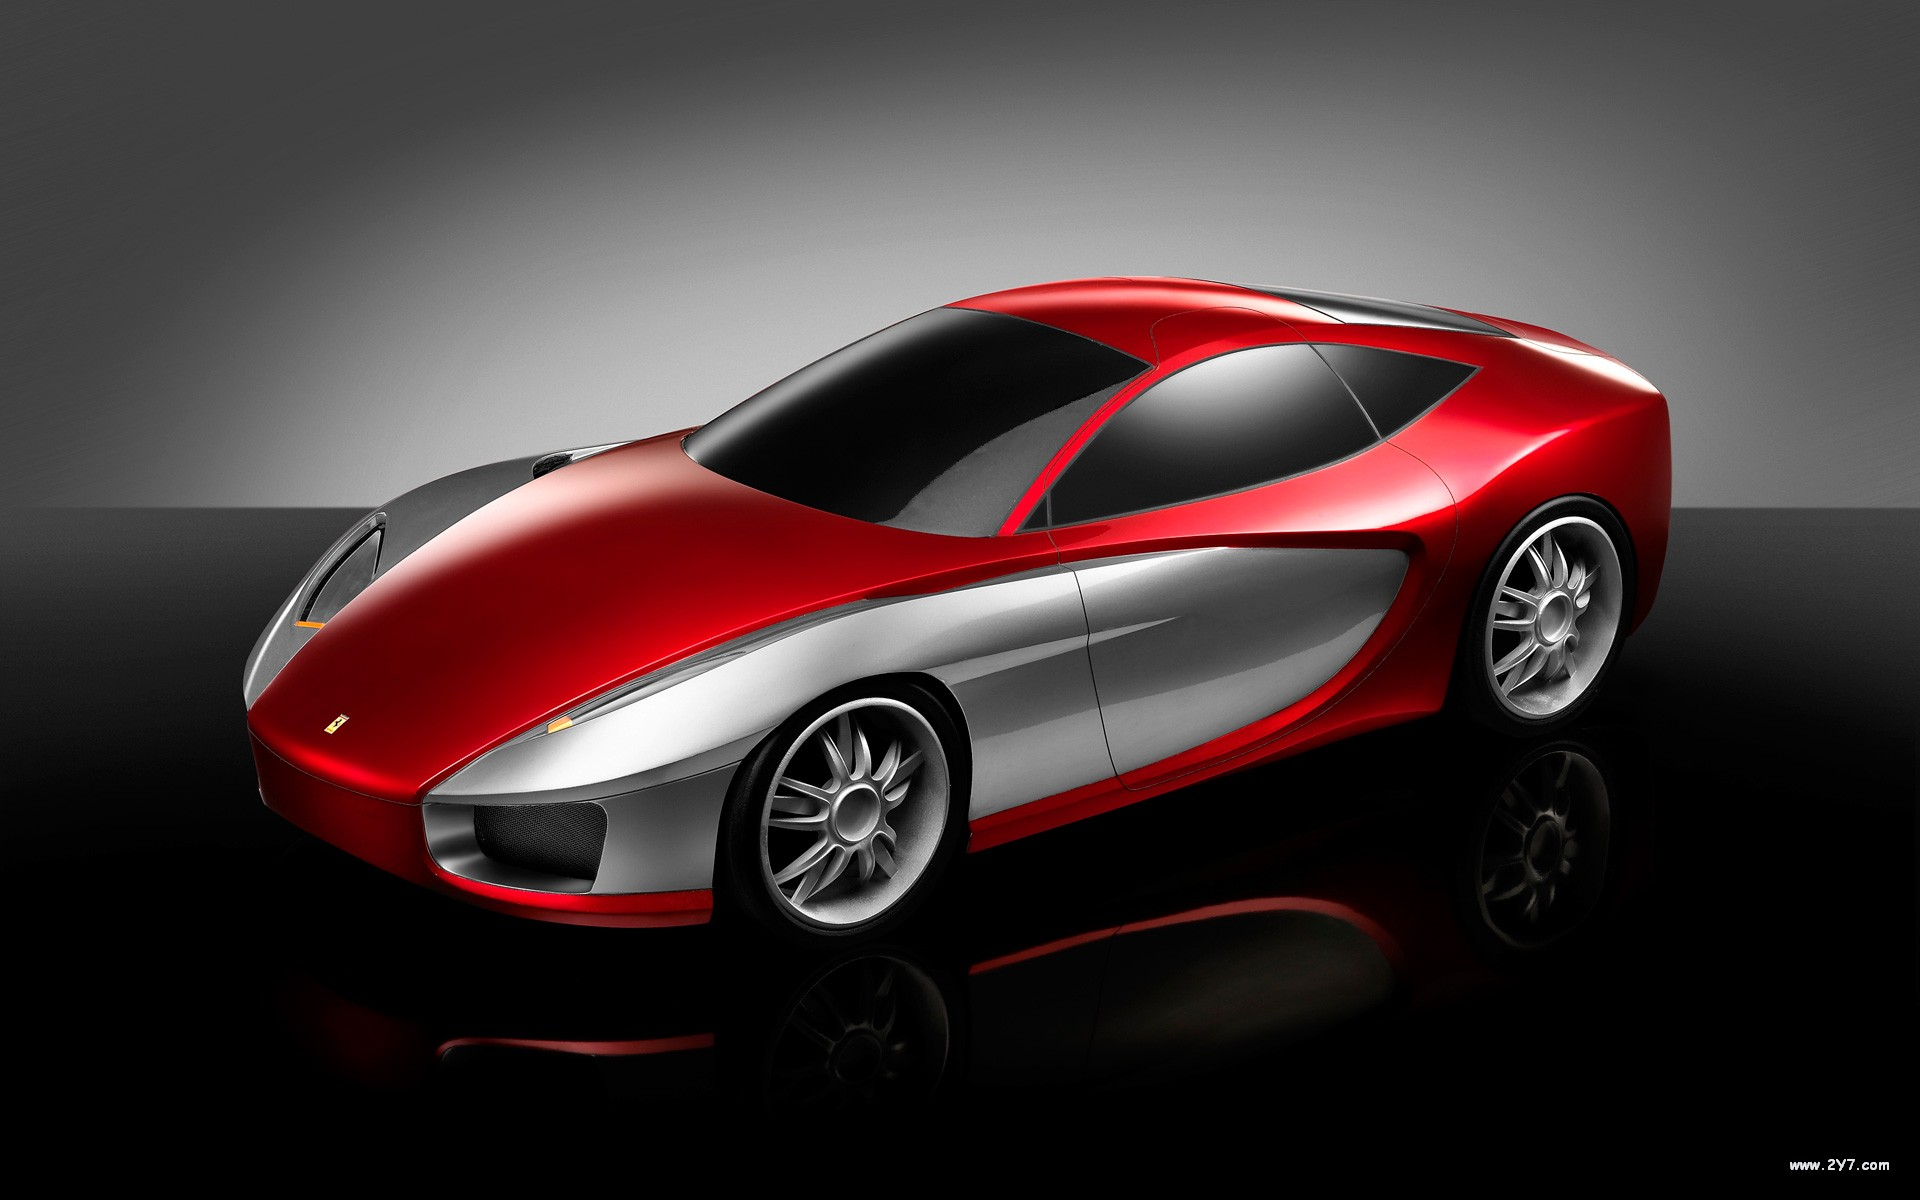 Kids-n-fun.com | Wallpaper Ferrari Concept Cars